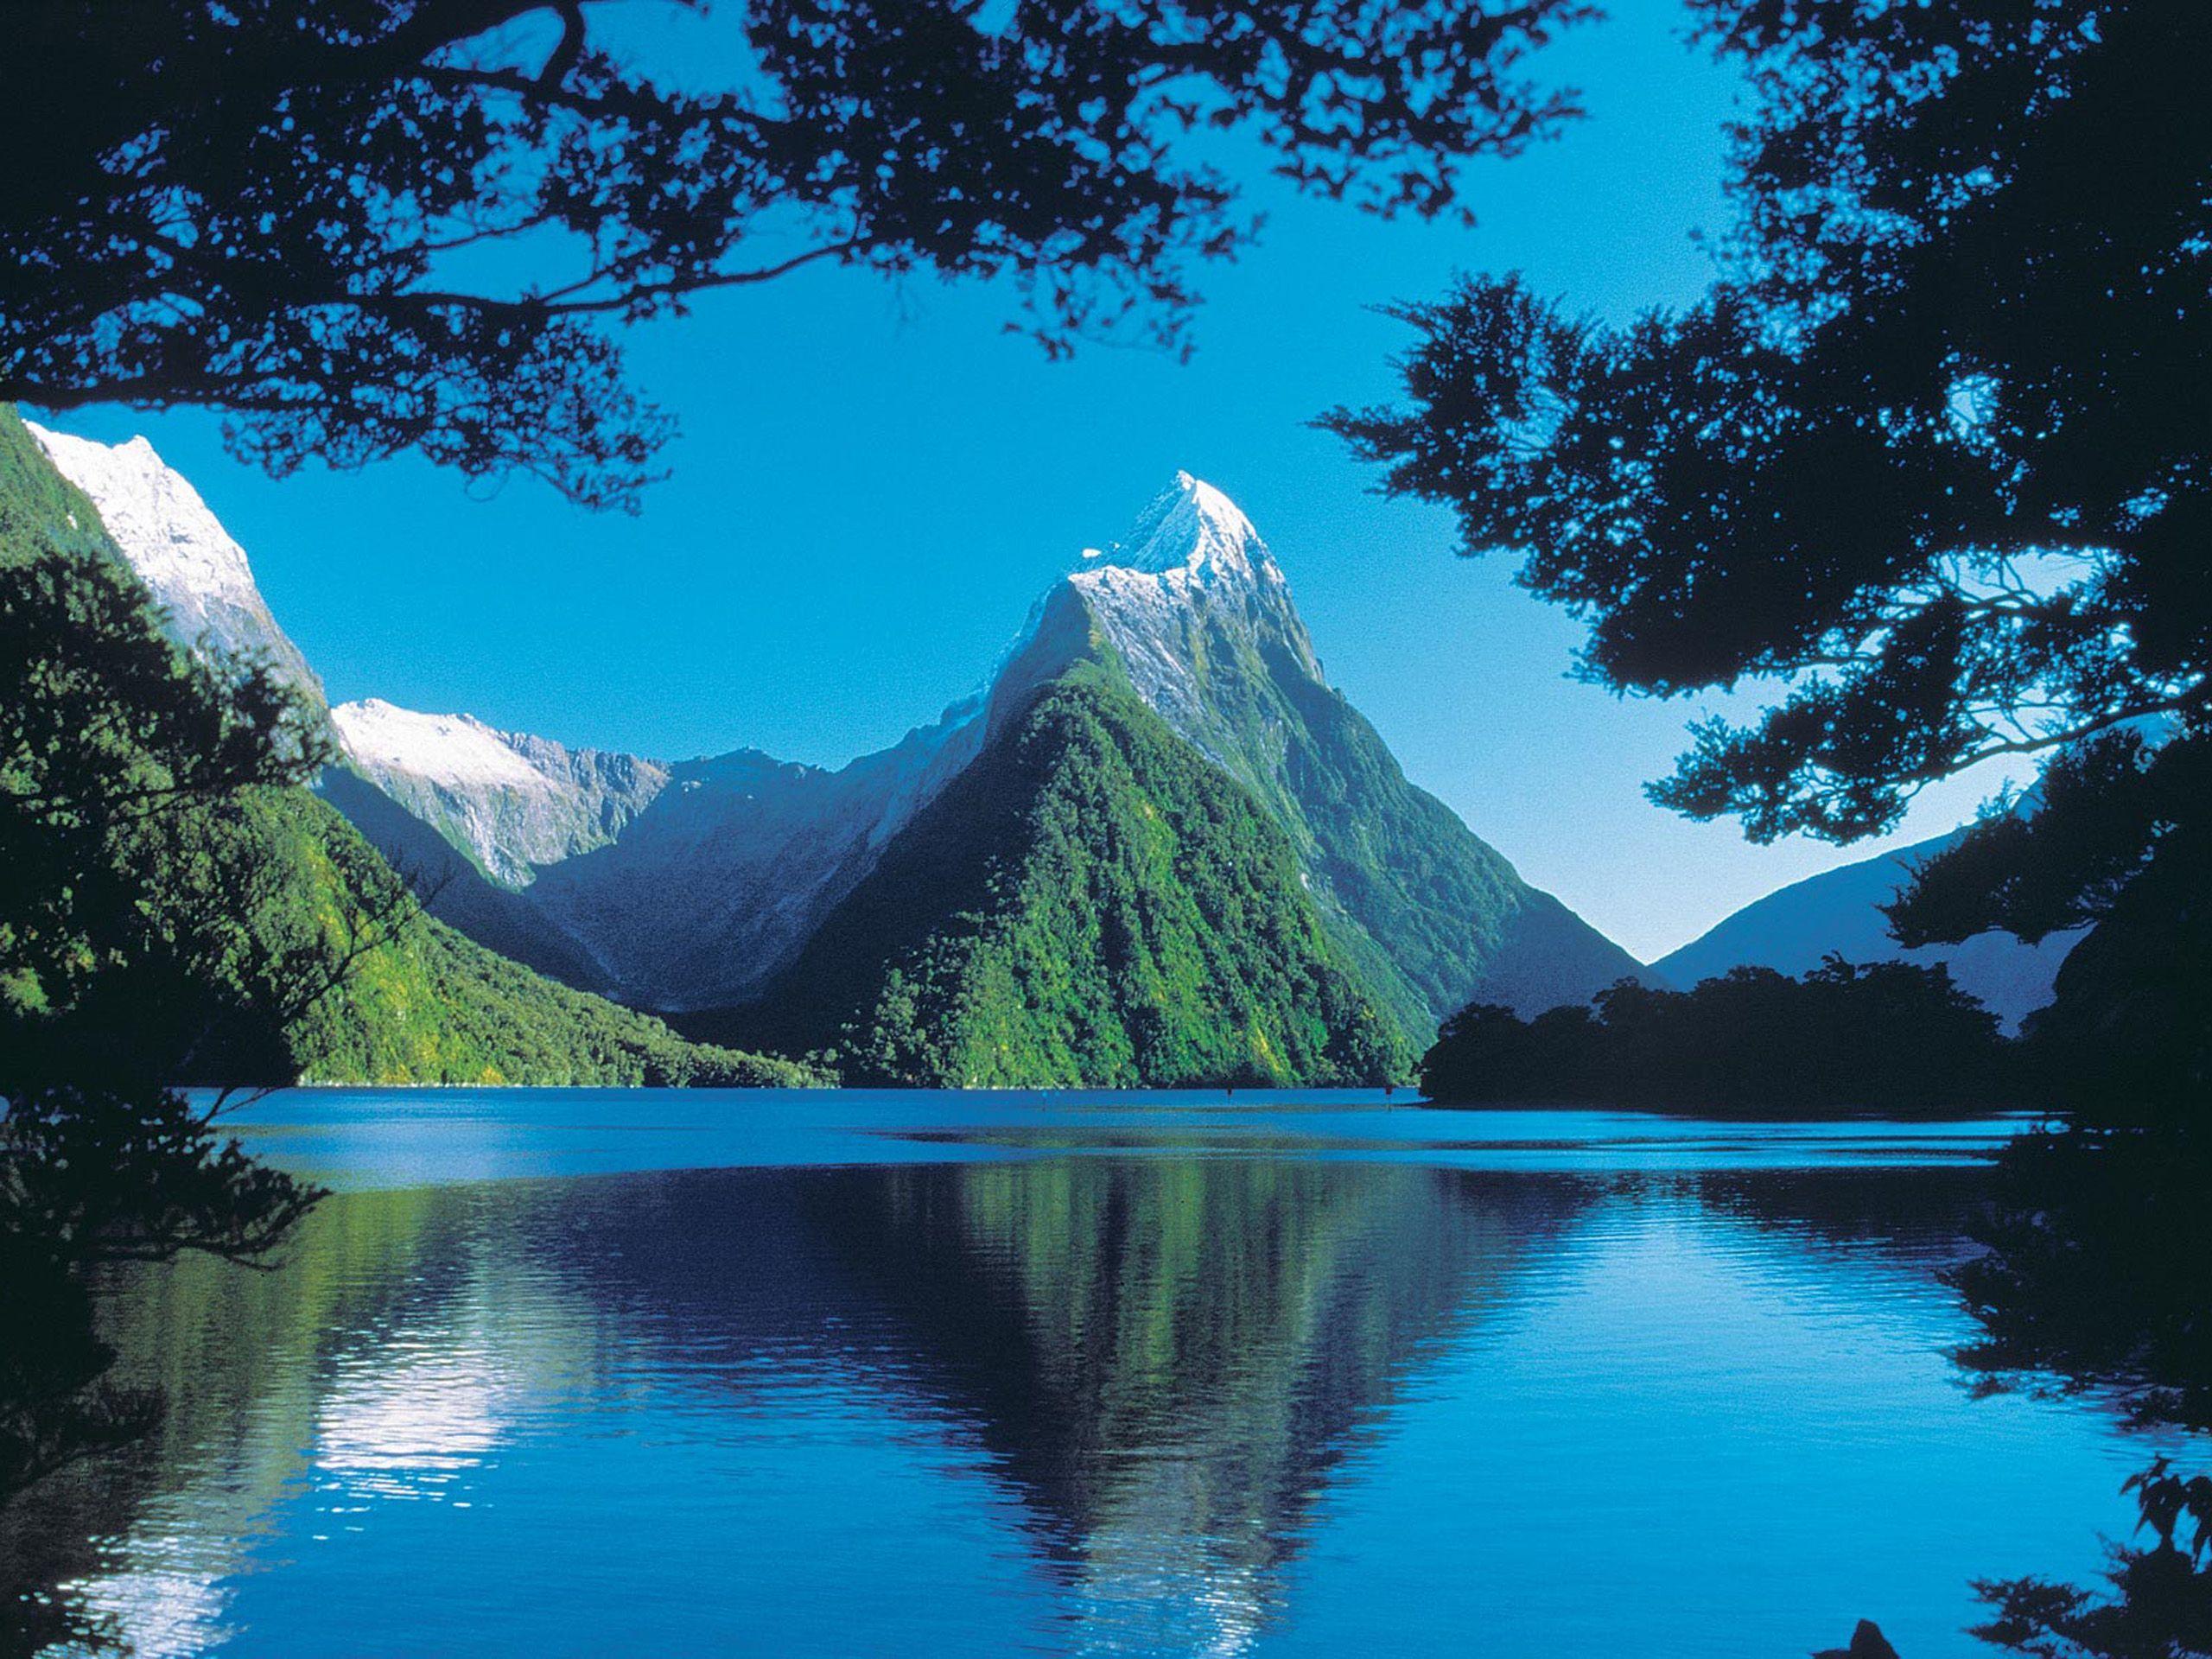 Milford-Sound-Fiordland-National-Park-New-Zealand